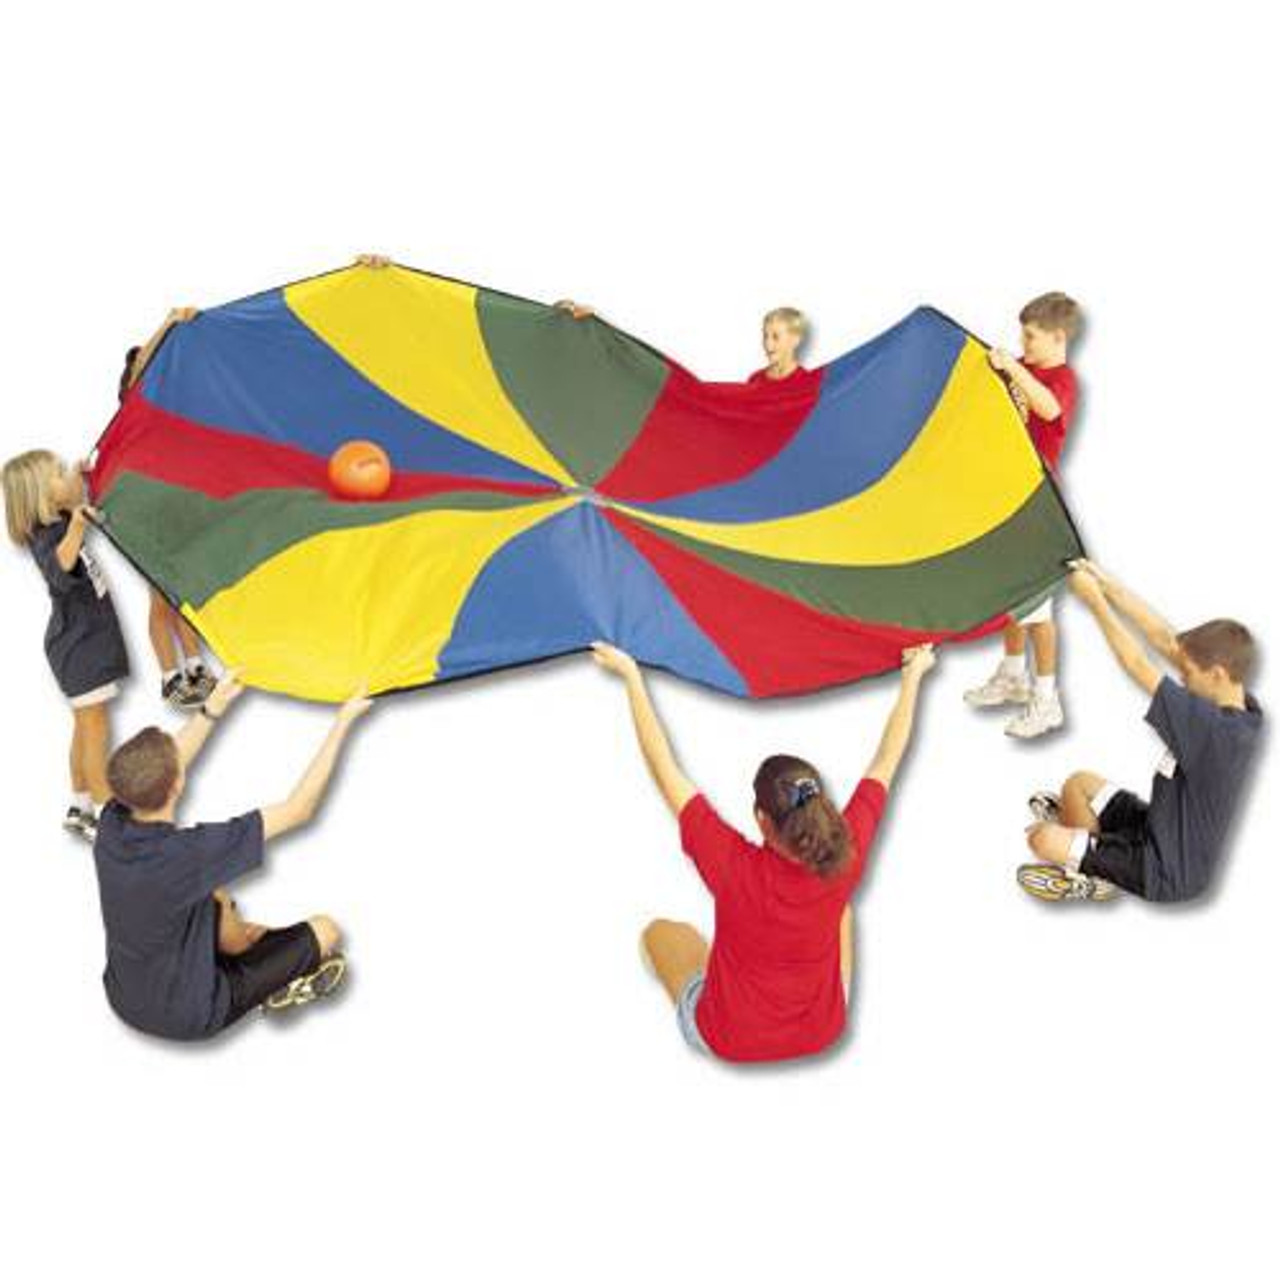 30' Parachute w/24 Handles